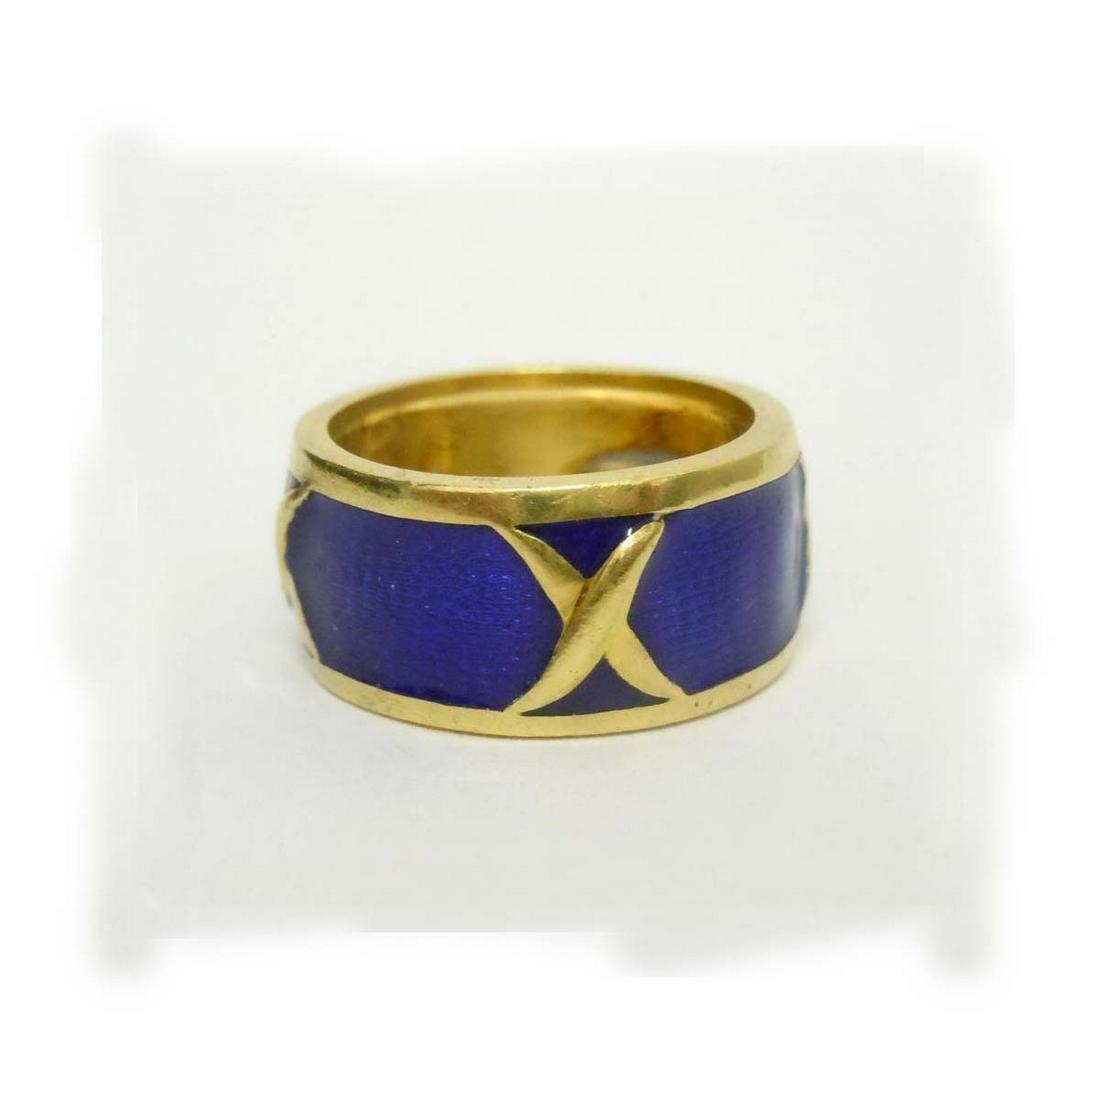 18Kt GOLD BLUE GUILLOCHE ENAMEL X MAVITO DESIGNER RING